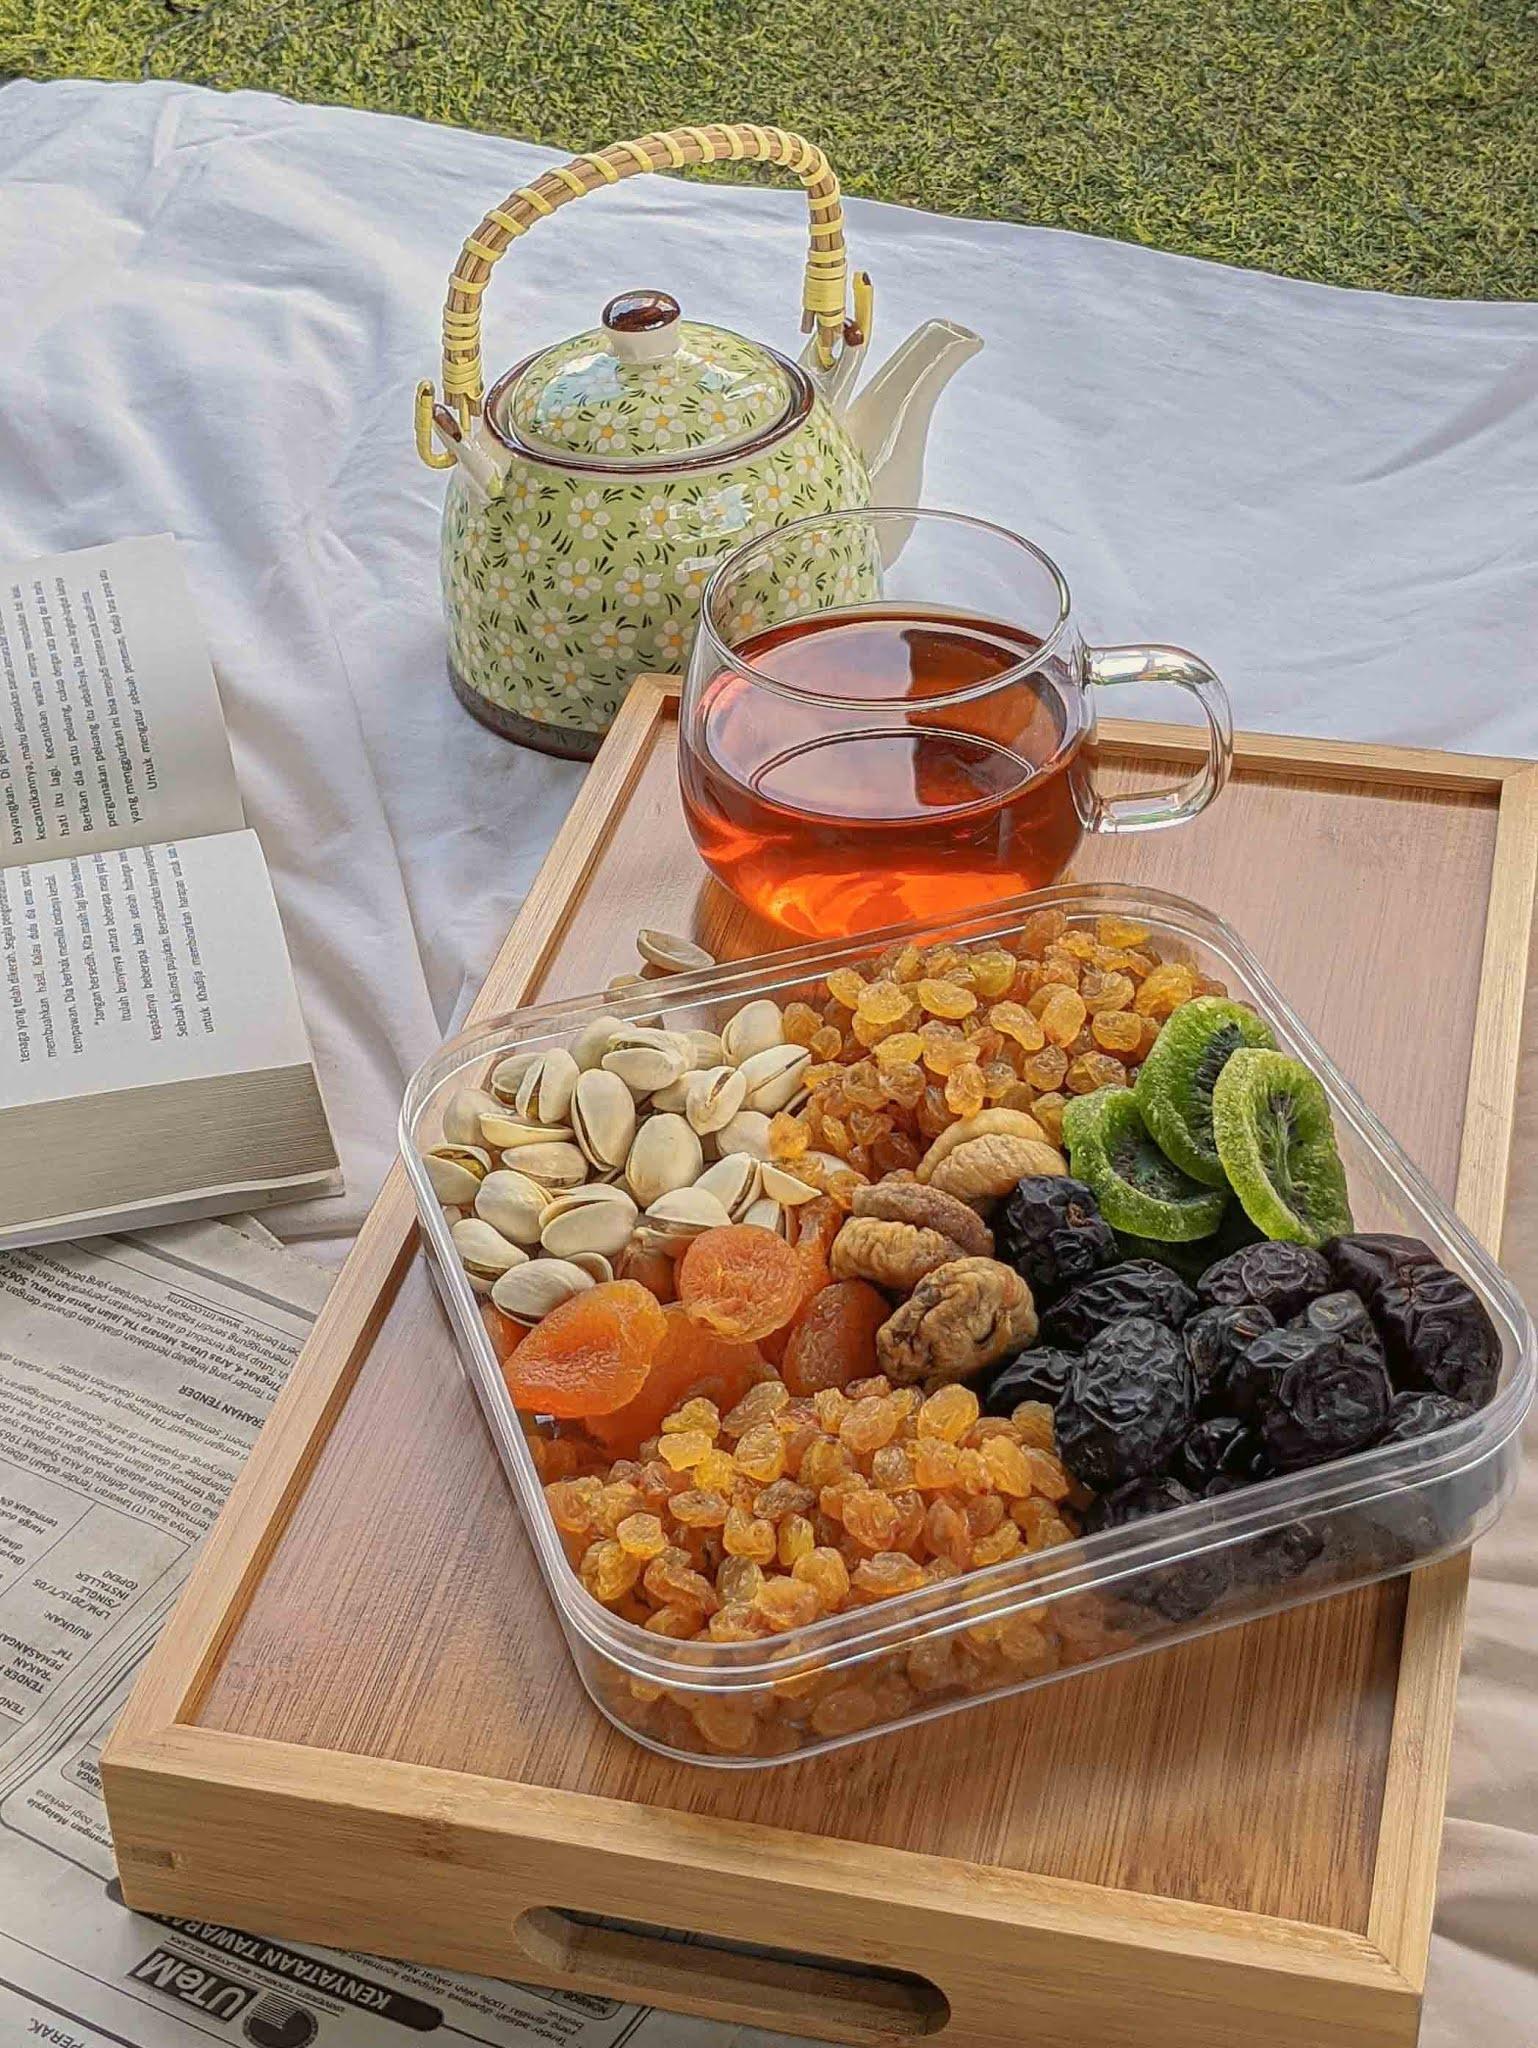 Beli Makanan Sunnah Mix Dry Food dan Dapatkan Voucher RM300 Kembara Sufi Travel Tours